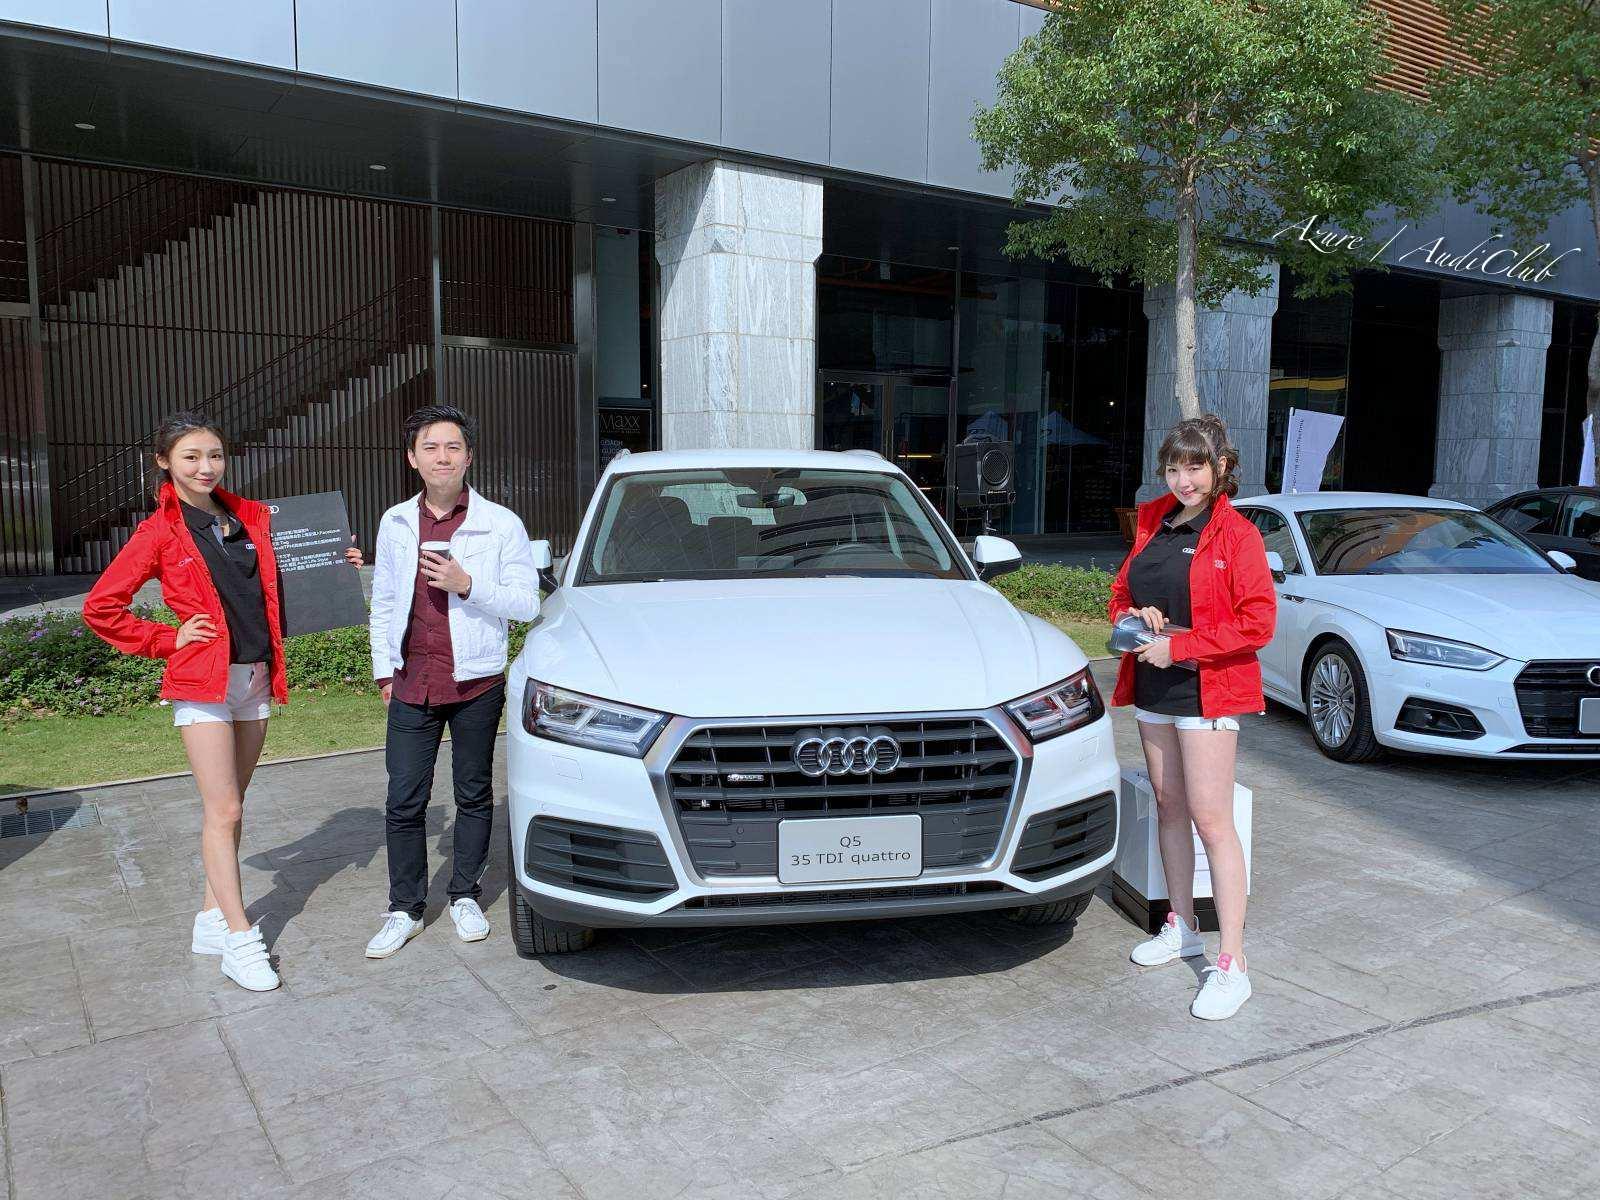 Audi-club全台奧迪車聚,超過兩百台奧迪齊聚苗栗尚順育樂中心 Azure 許政淳 with Show girl